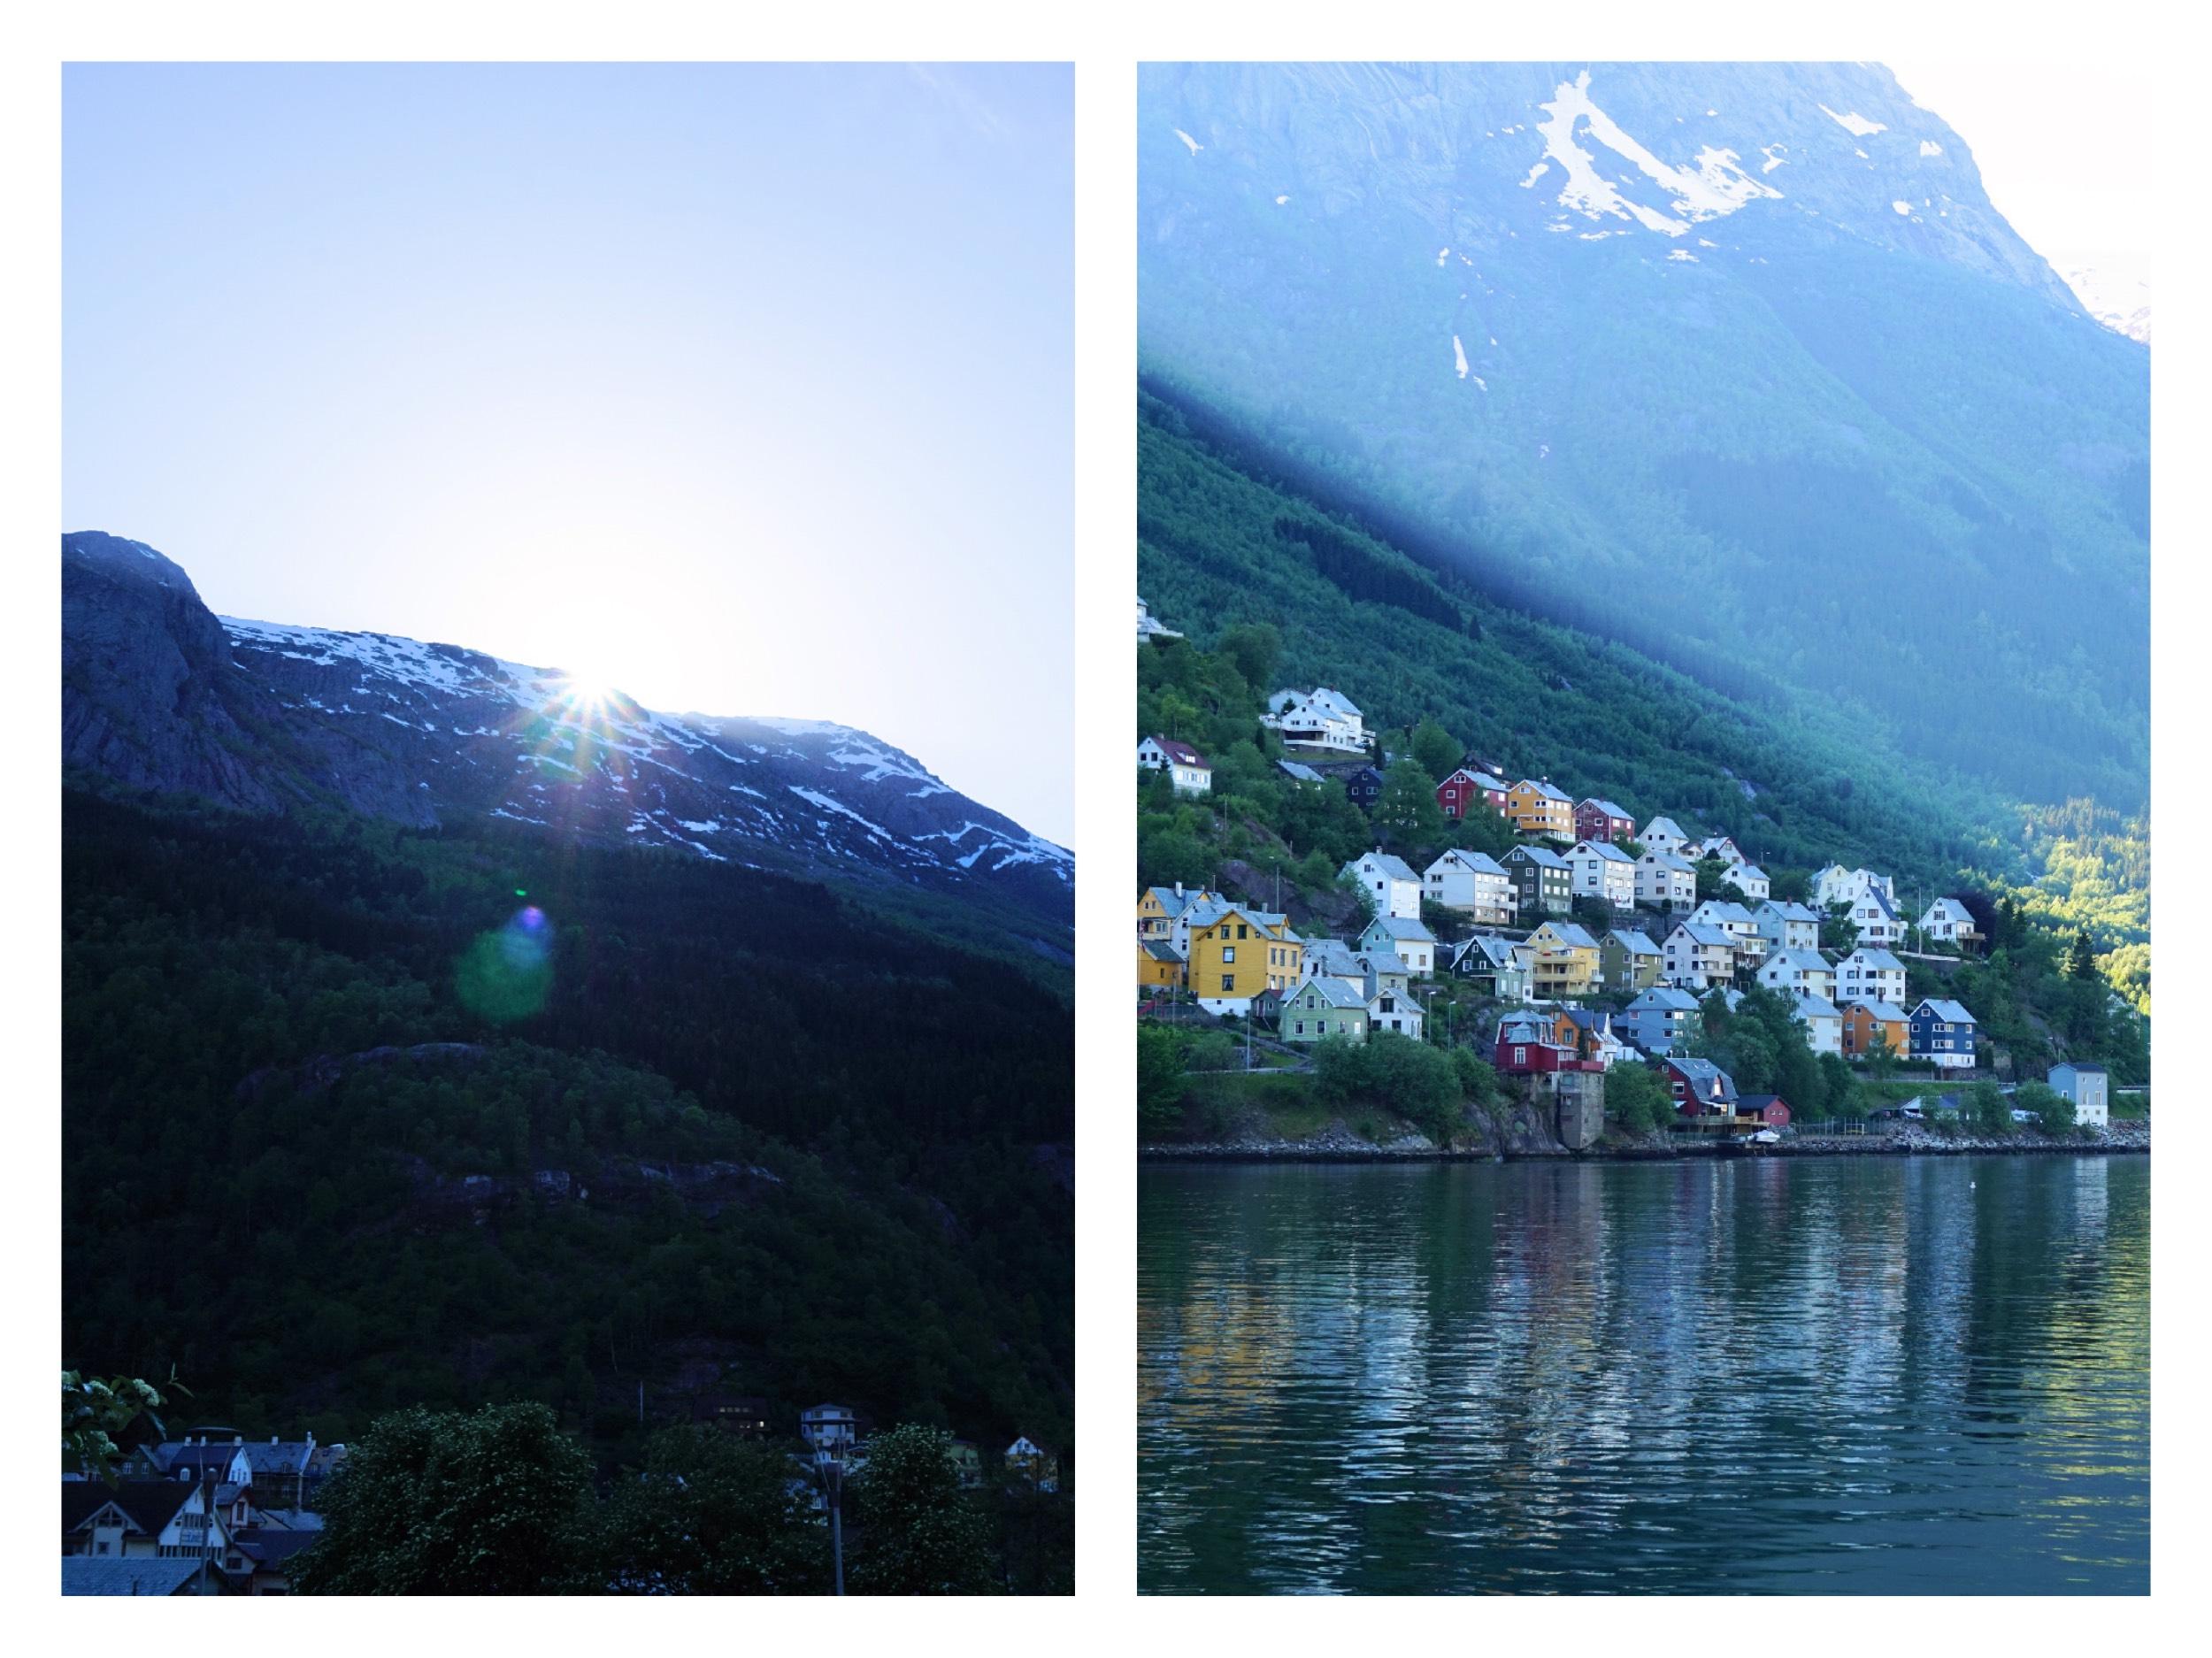 3-jours-en-Norvege-Odda